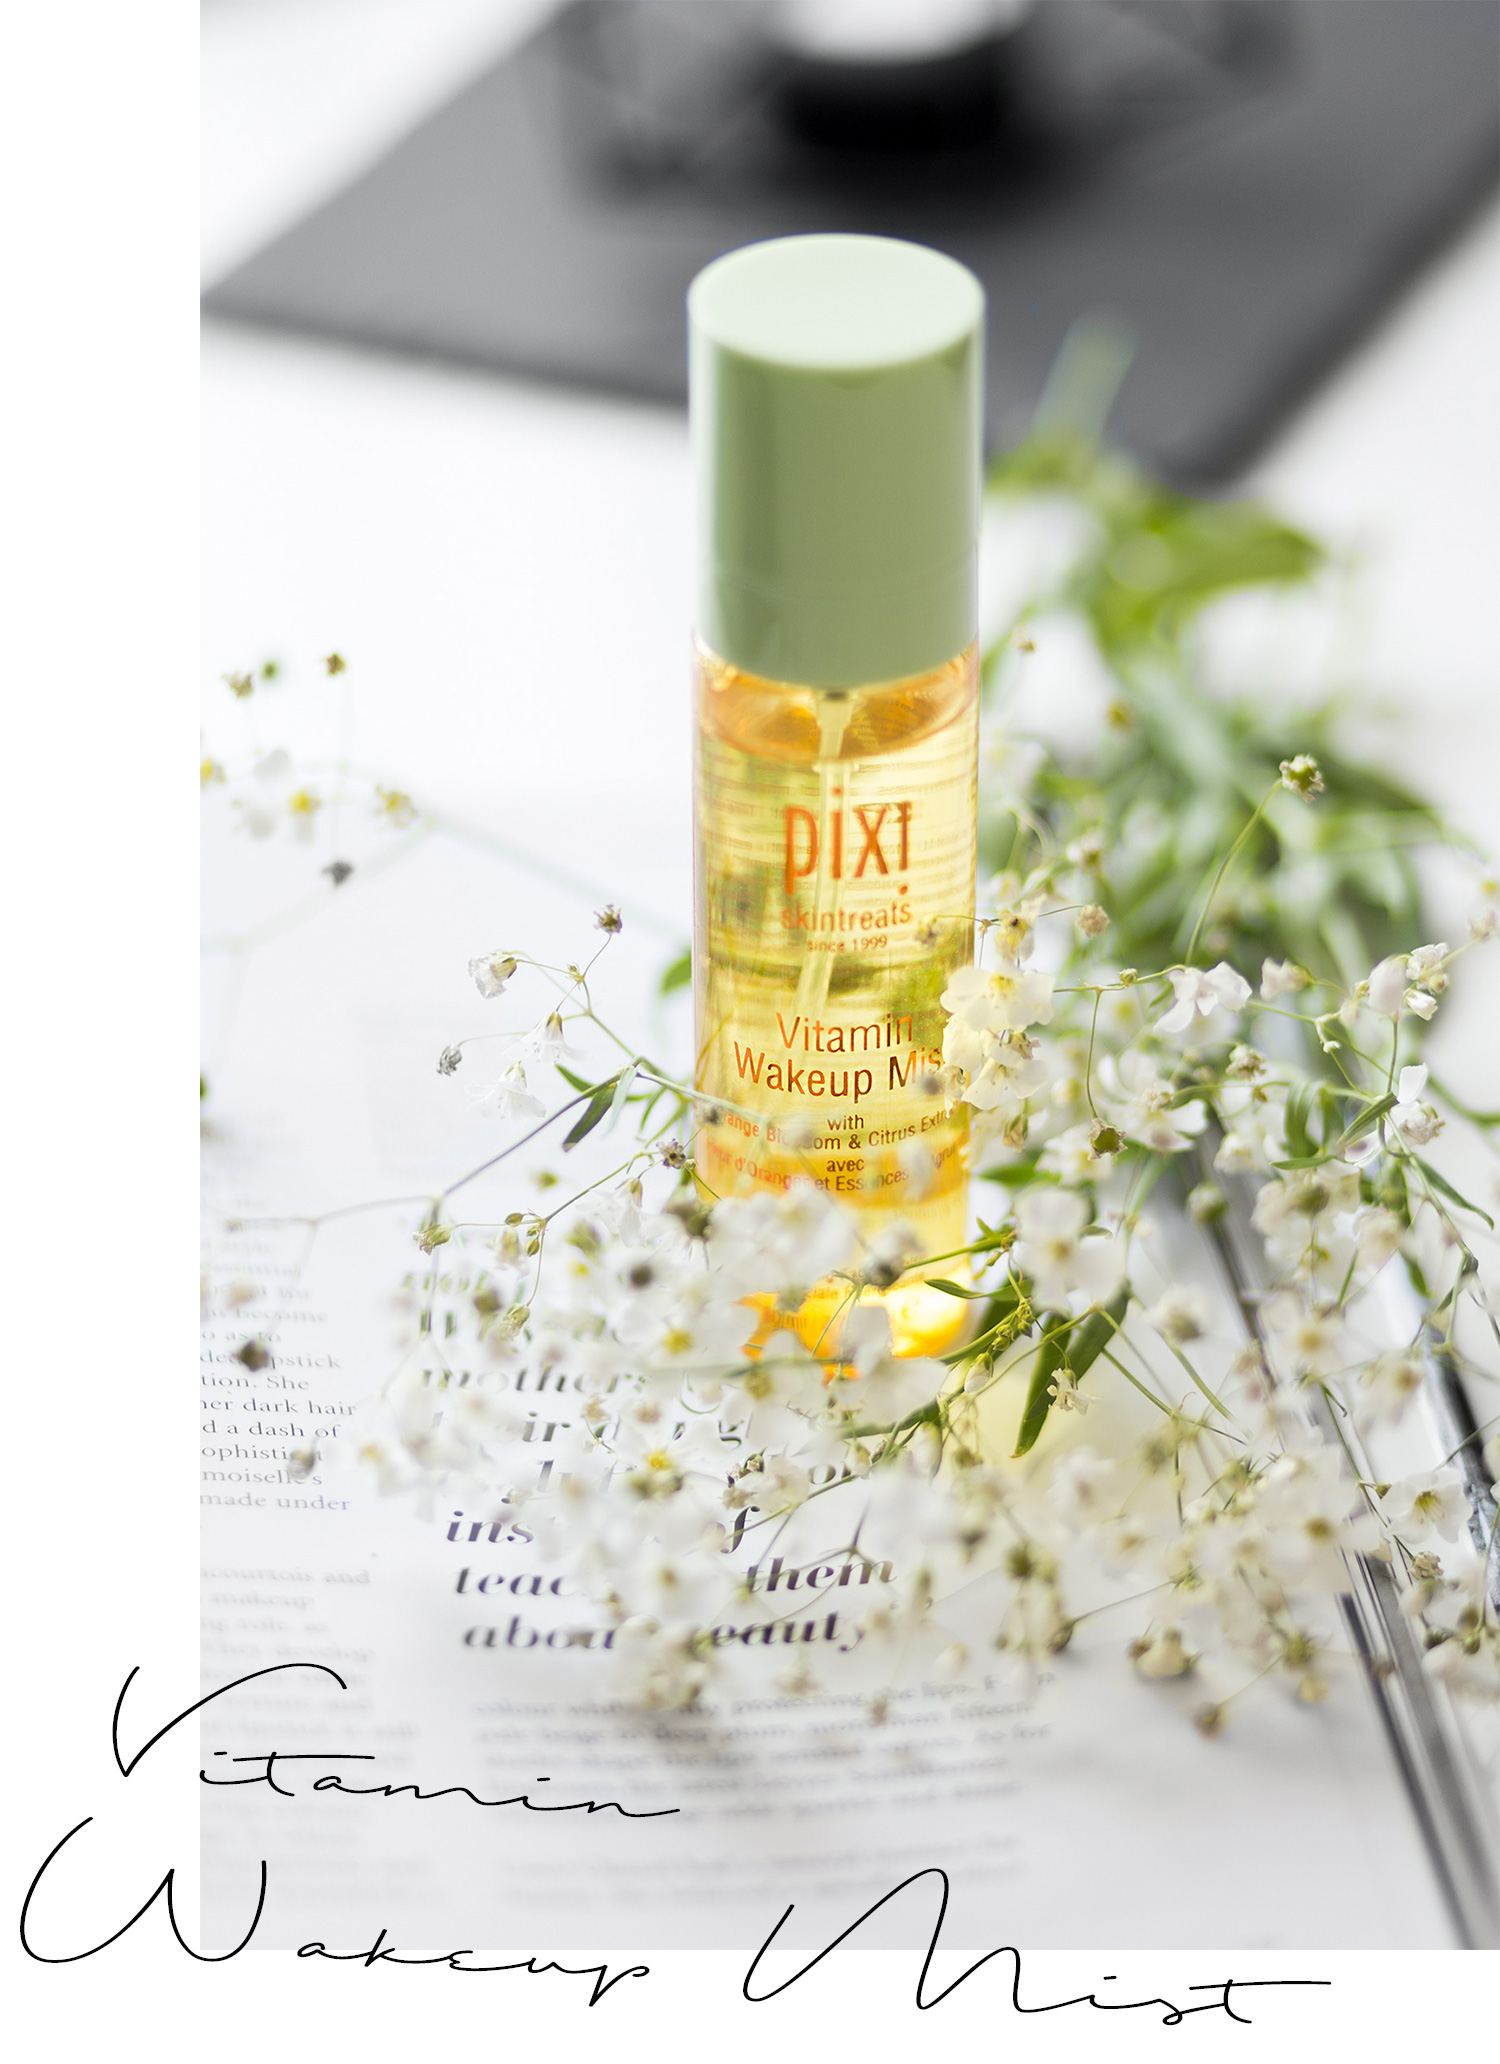 Neuheiten von Pixi, Vitamin Wakeup Mist Erfahrung, Hautpflege im Test, strahlende Haut im Sommer, Review, Skincare, Beauty, bezauberndenana.de